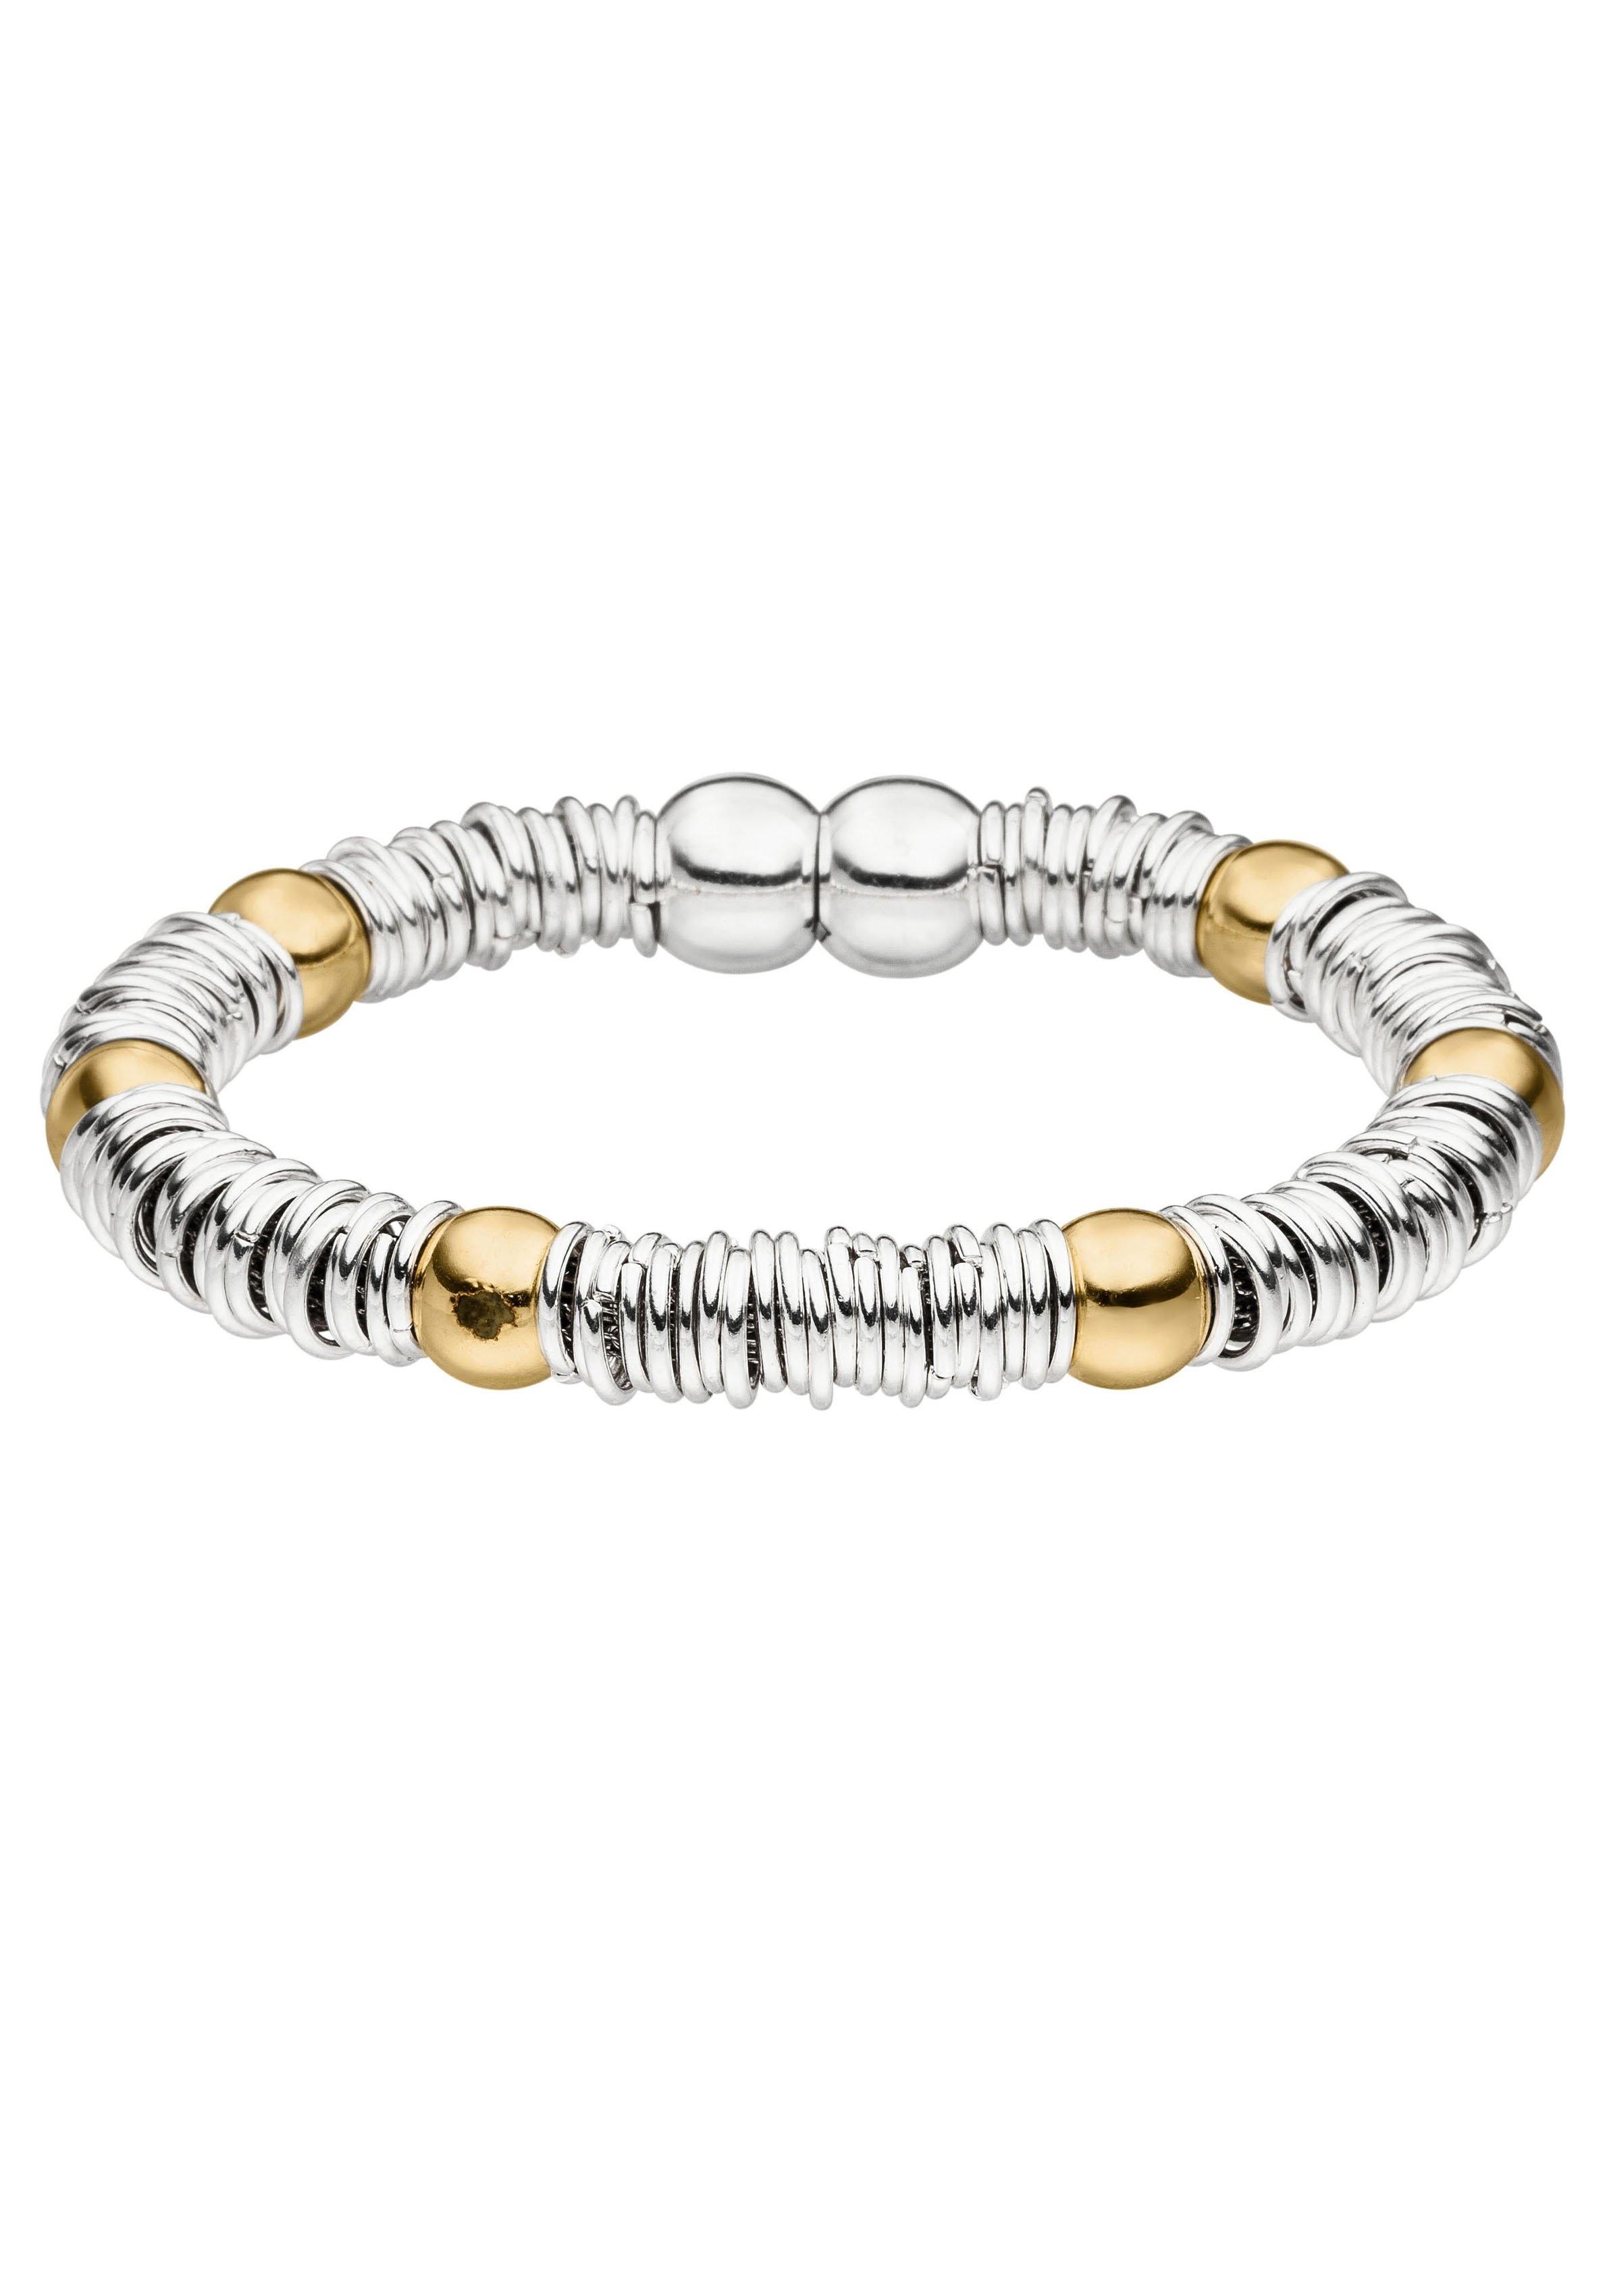 Tamaris armband Ezra, TF078 nu online kopen bij OTTO